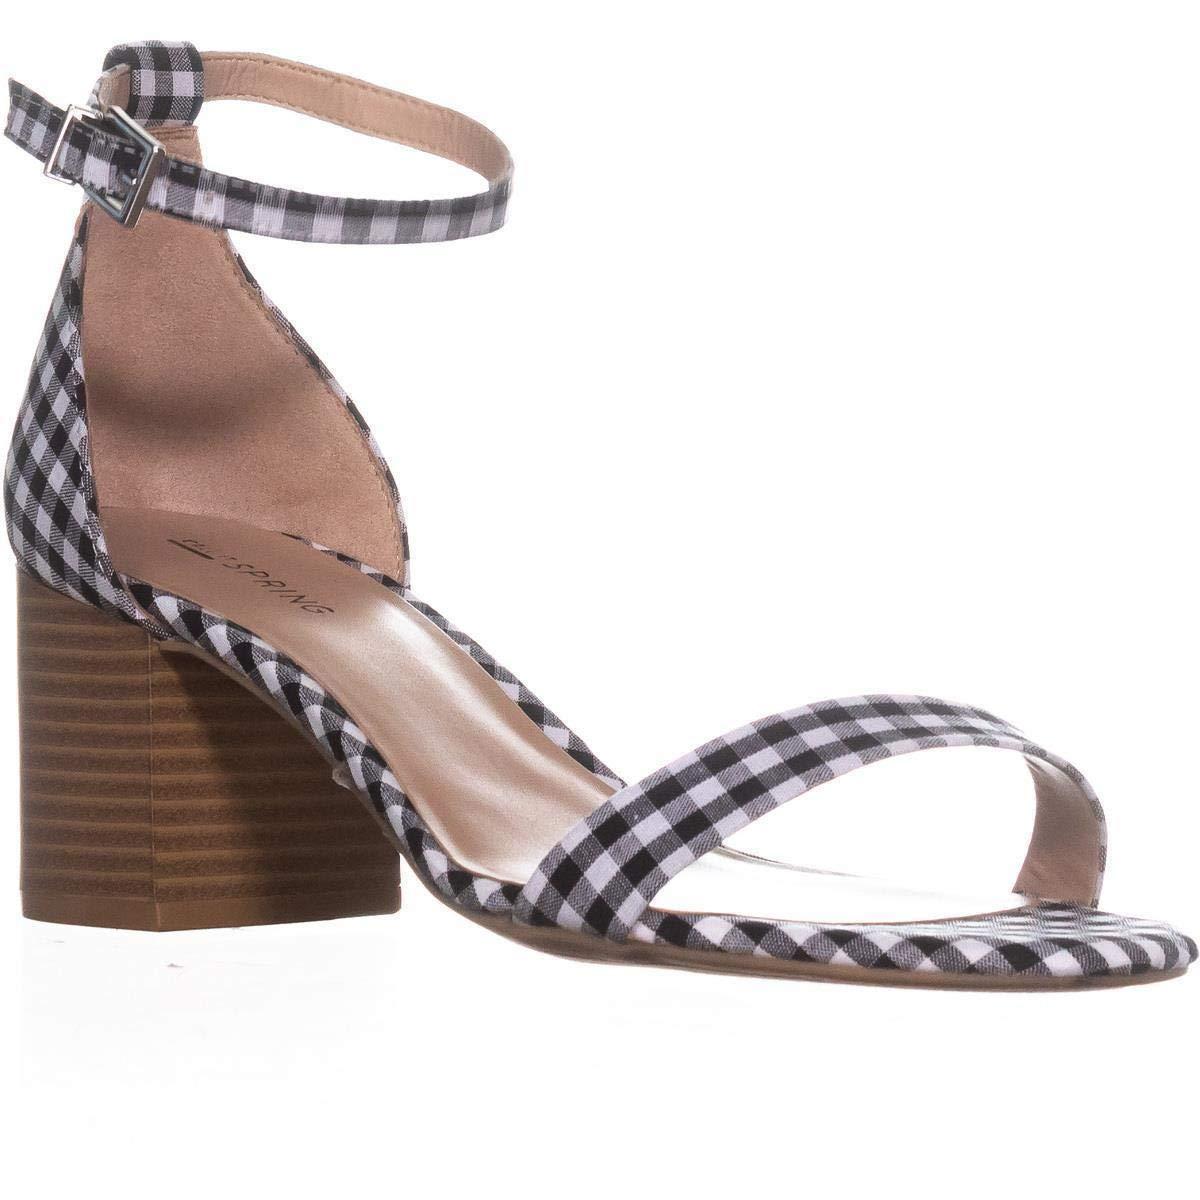 ec5b5202619 Amazon.com  Call It Spring Stangarone Ankle Strap Sandals